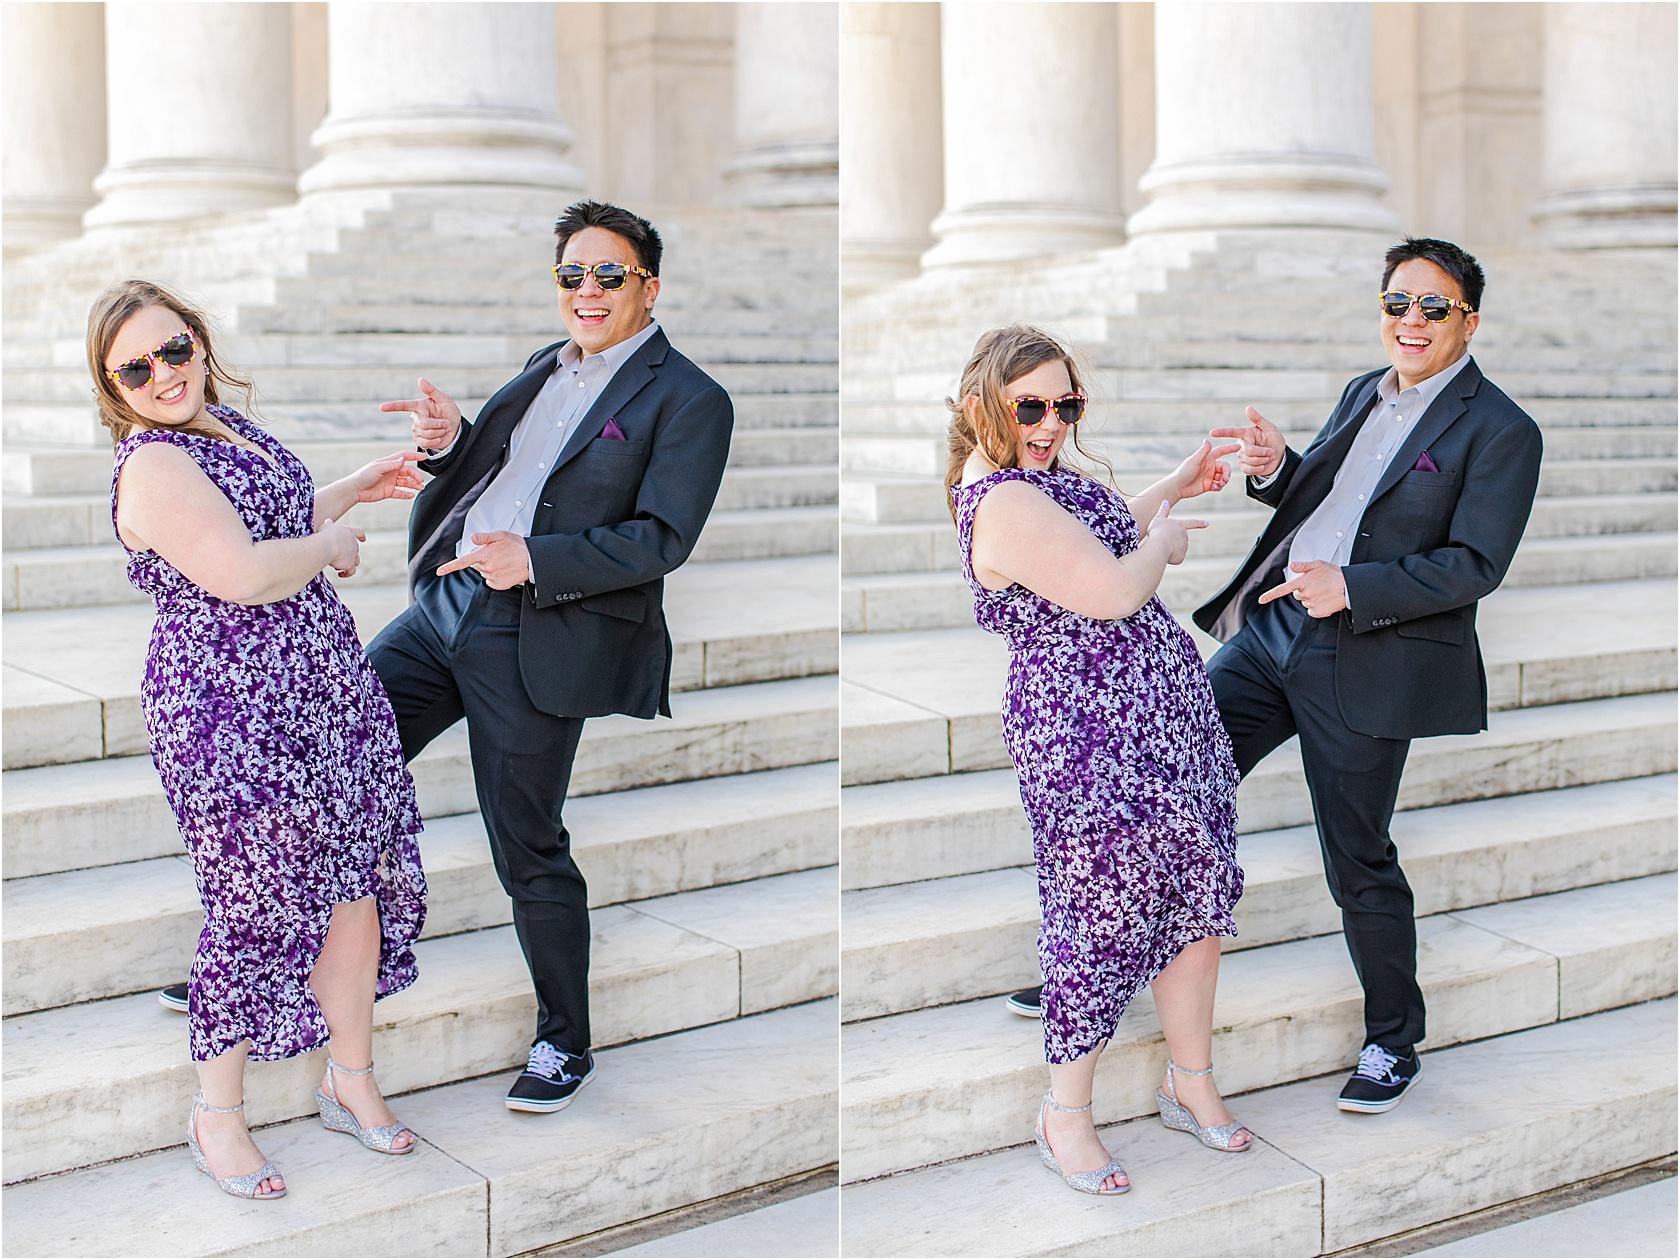 MelissaKevinCherryBlossomsDCEngagementSessionMarch2019LivingRadiantPhotographyphotos_0030.jpg